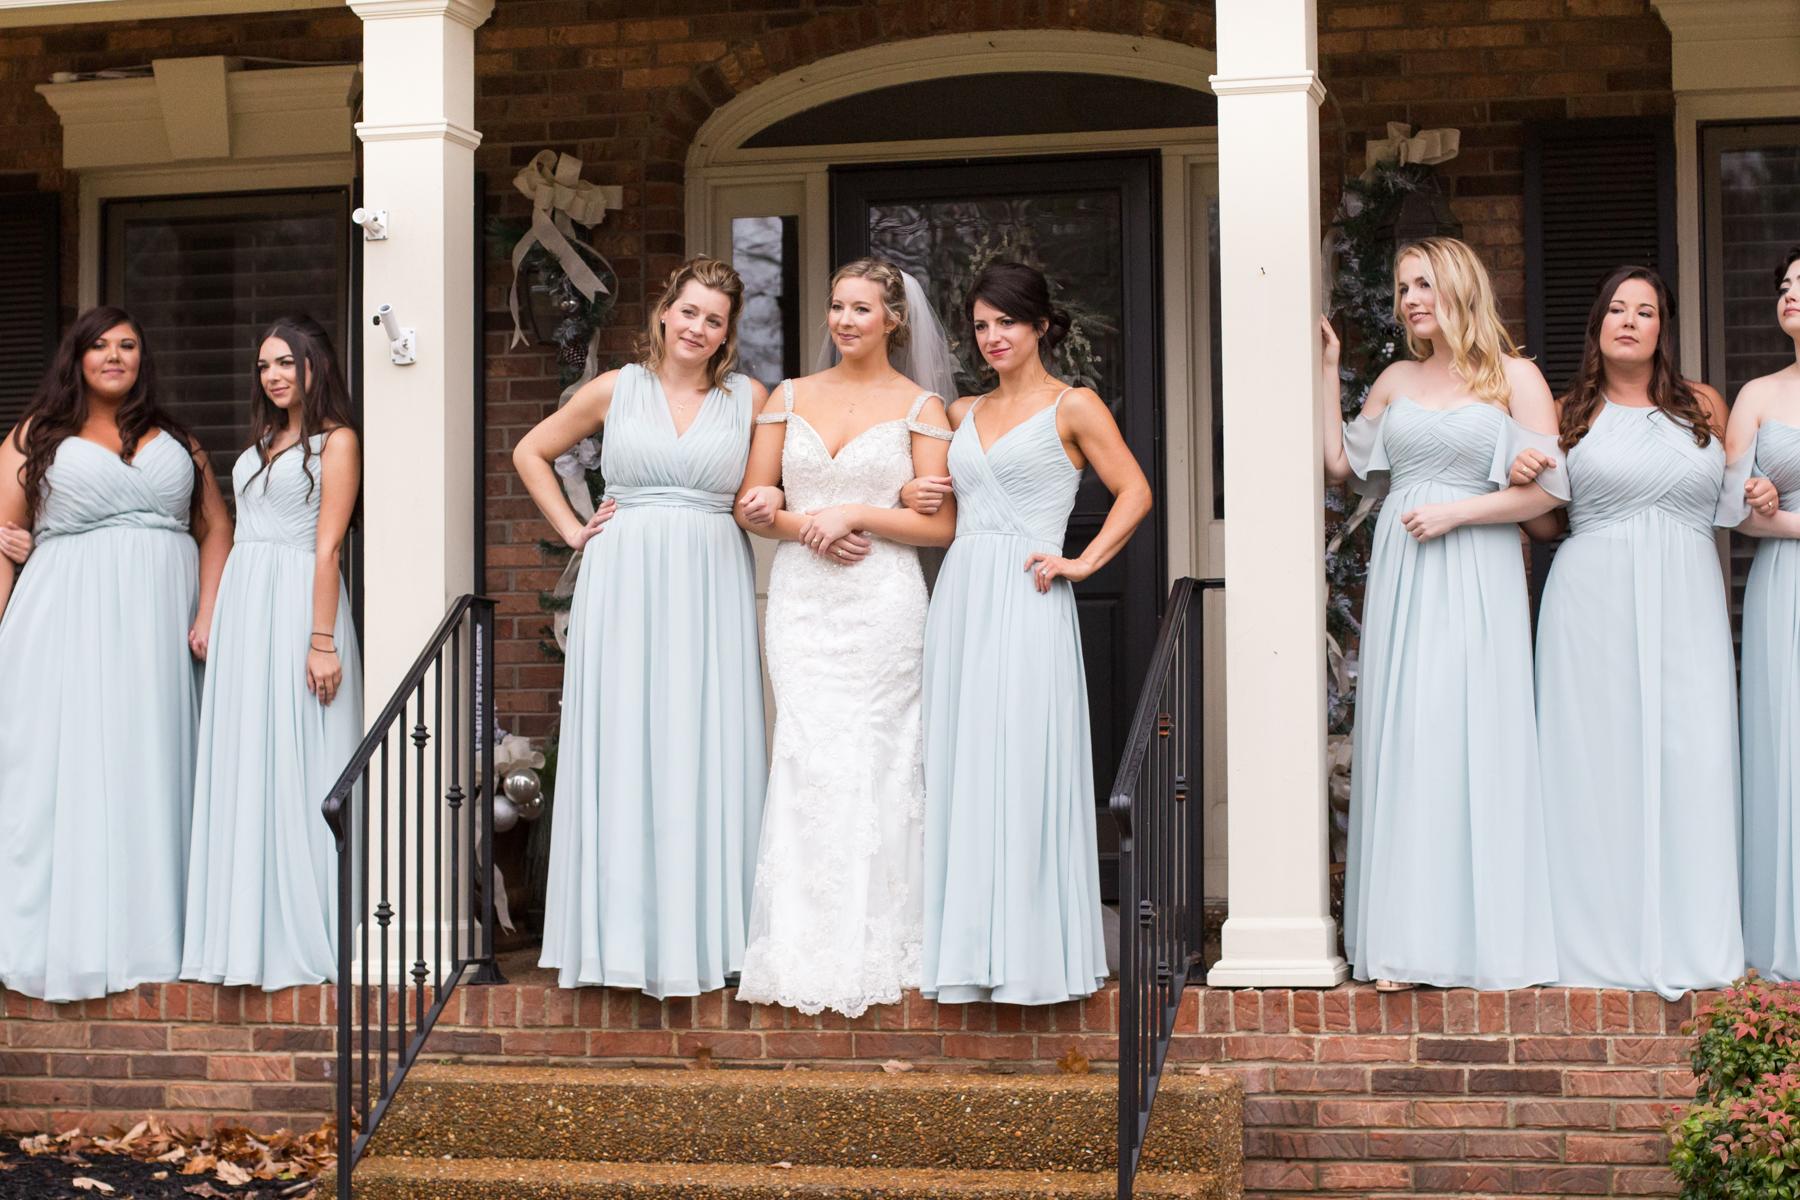 Kelli-and-Matt-Nashville-Wedding-Sneak-Peak-0092.jpg